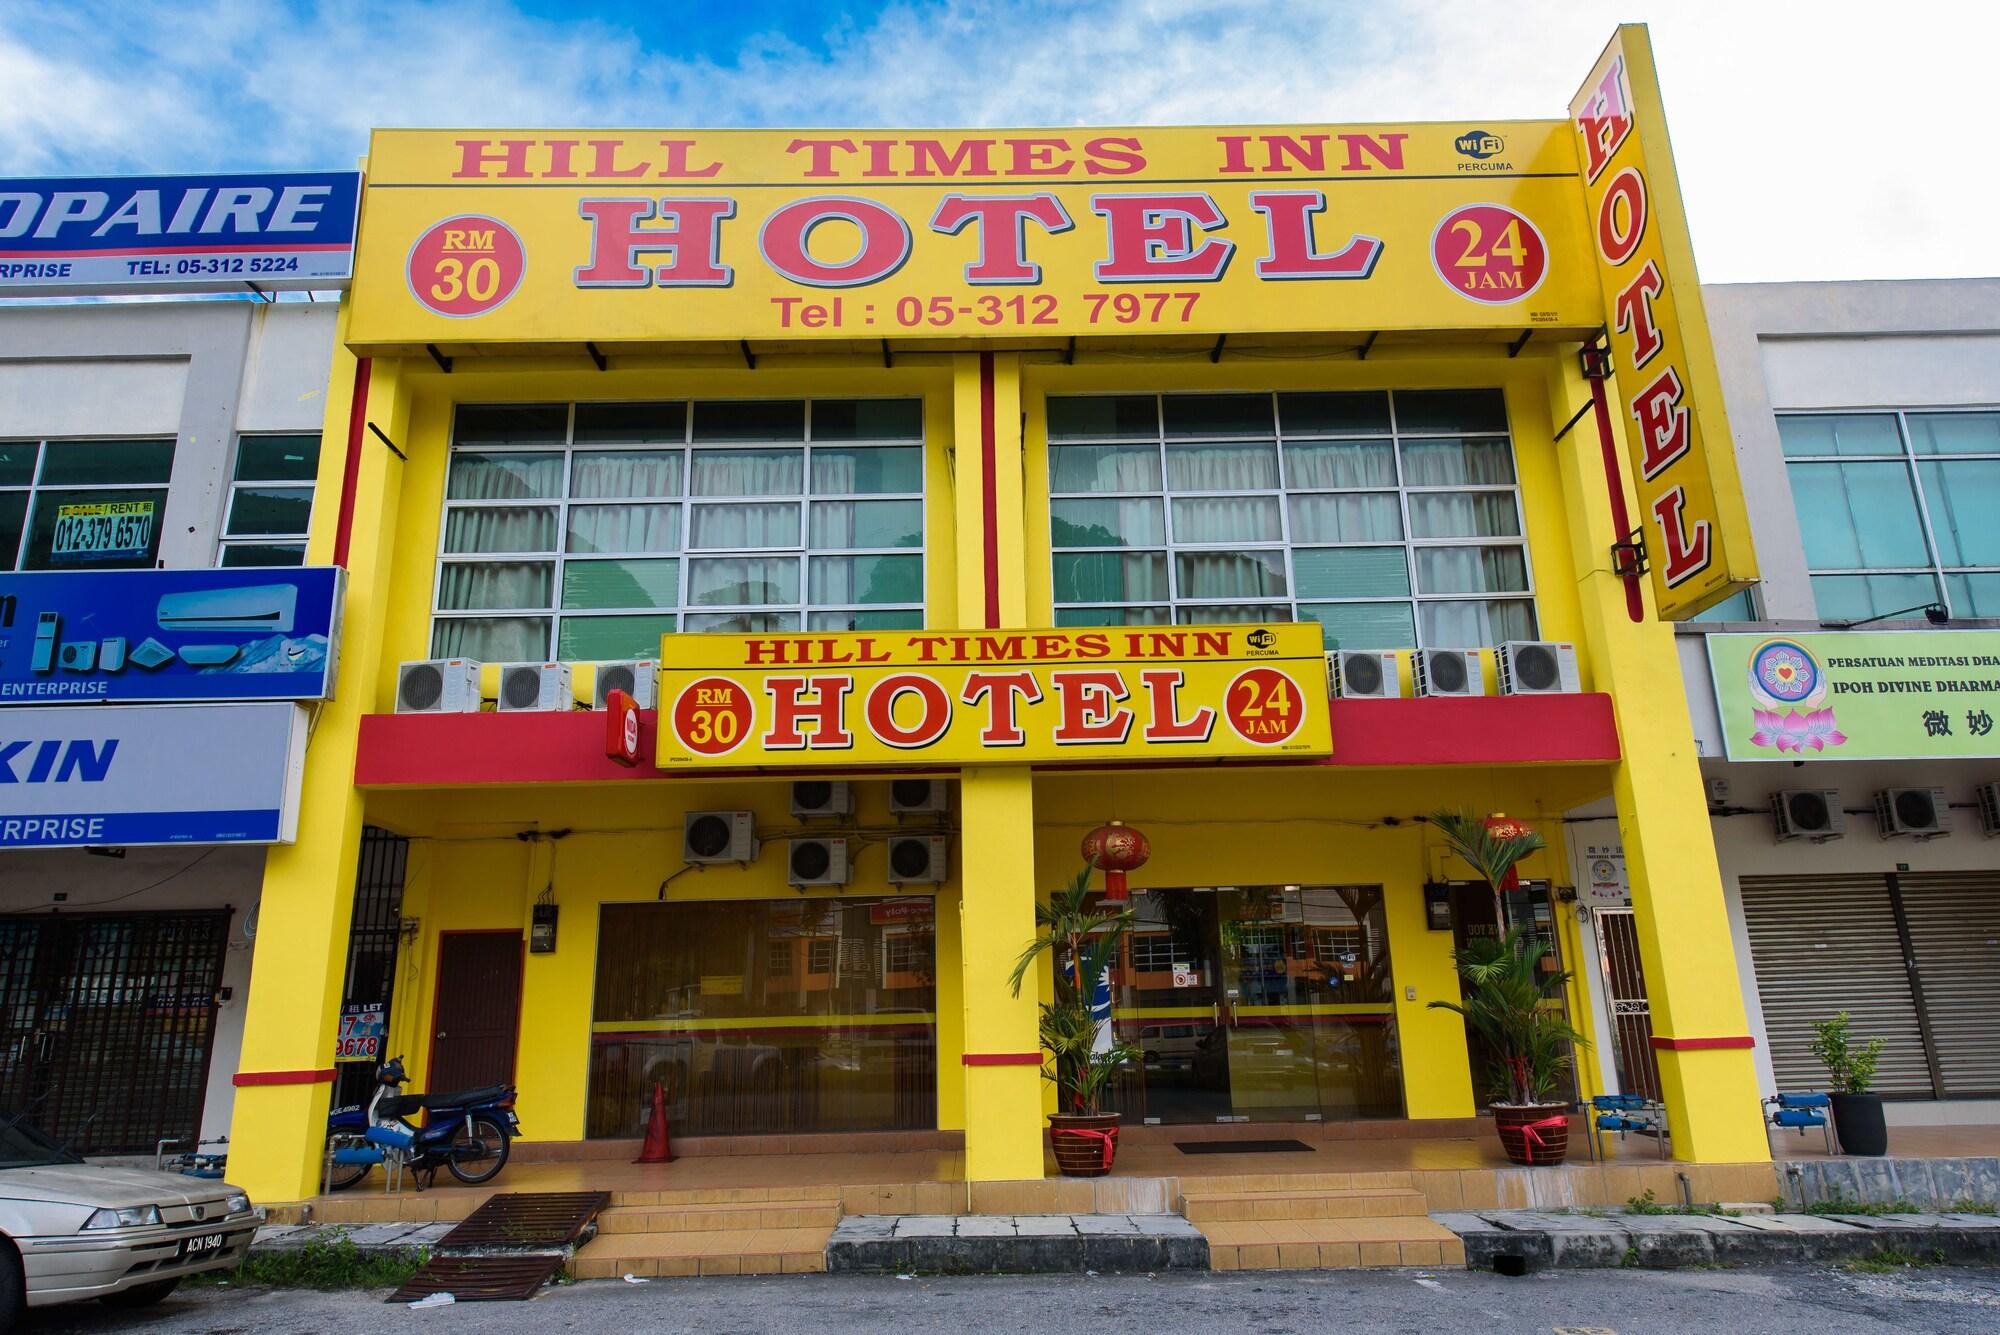 Hill Times Inn Hotel, Kinta